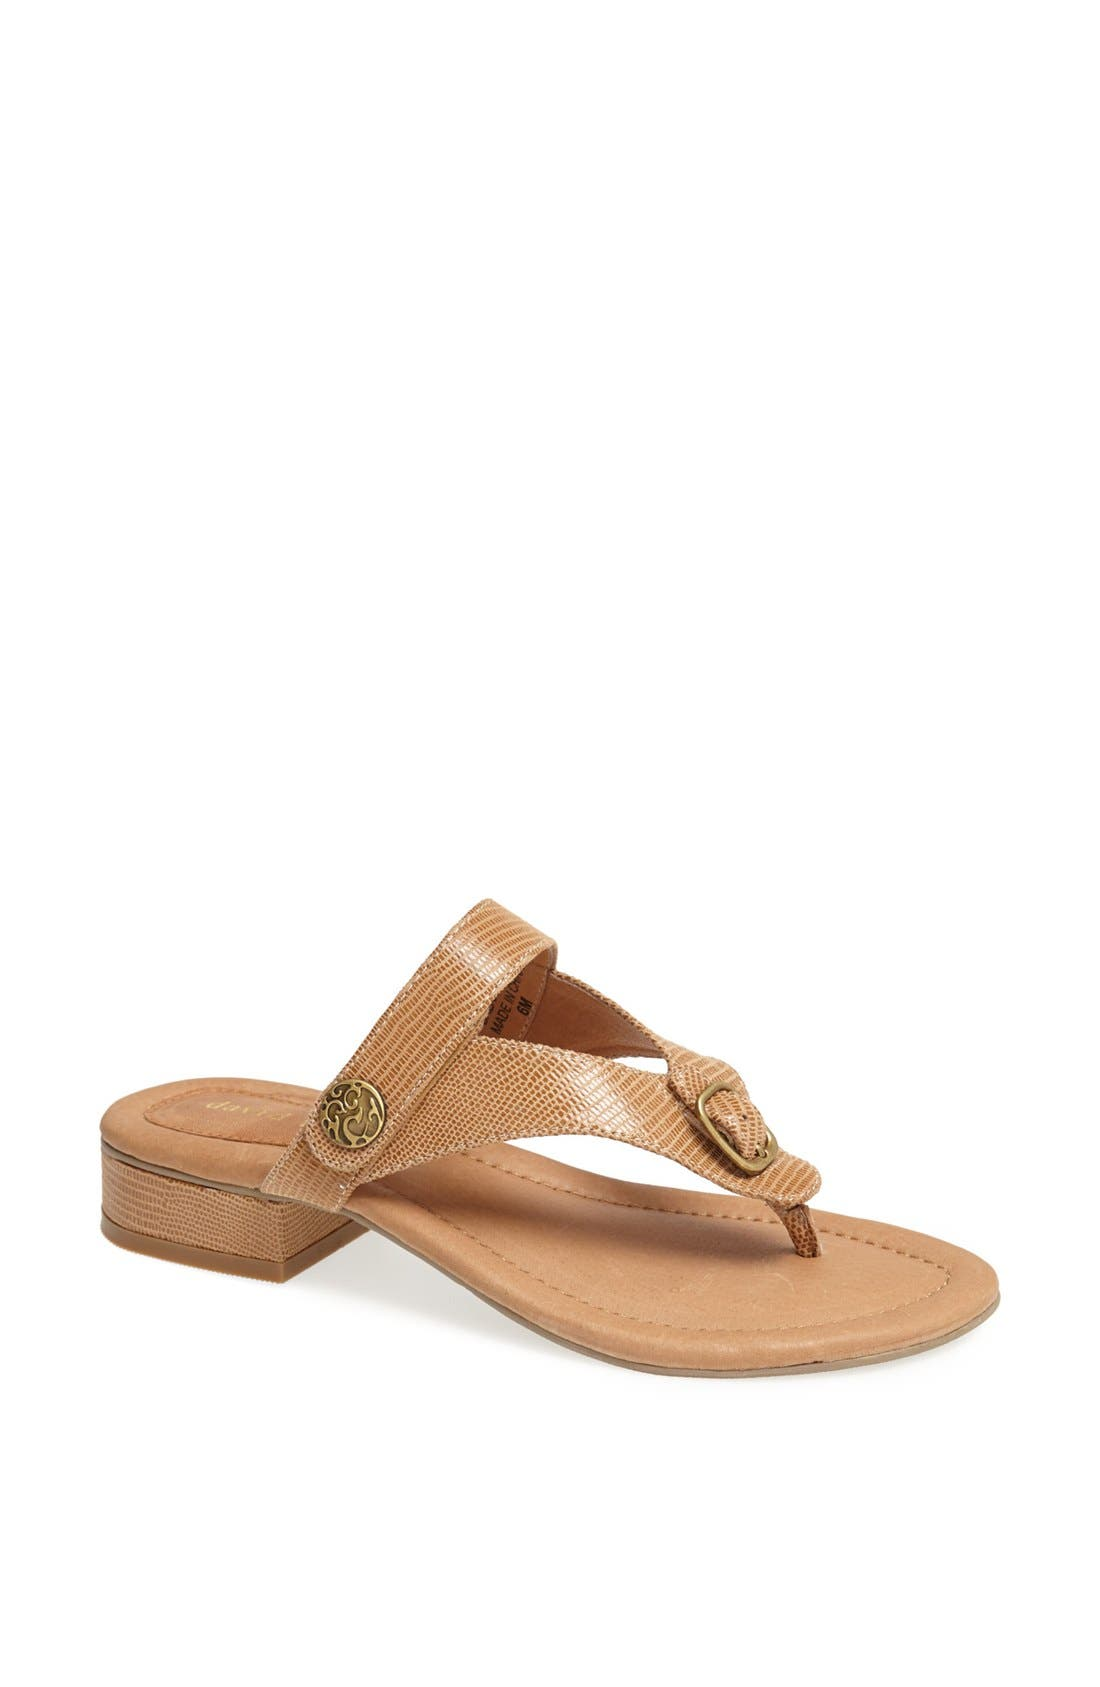 Alternate Image 1 Selected - David Tate 'Amber' Sandal